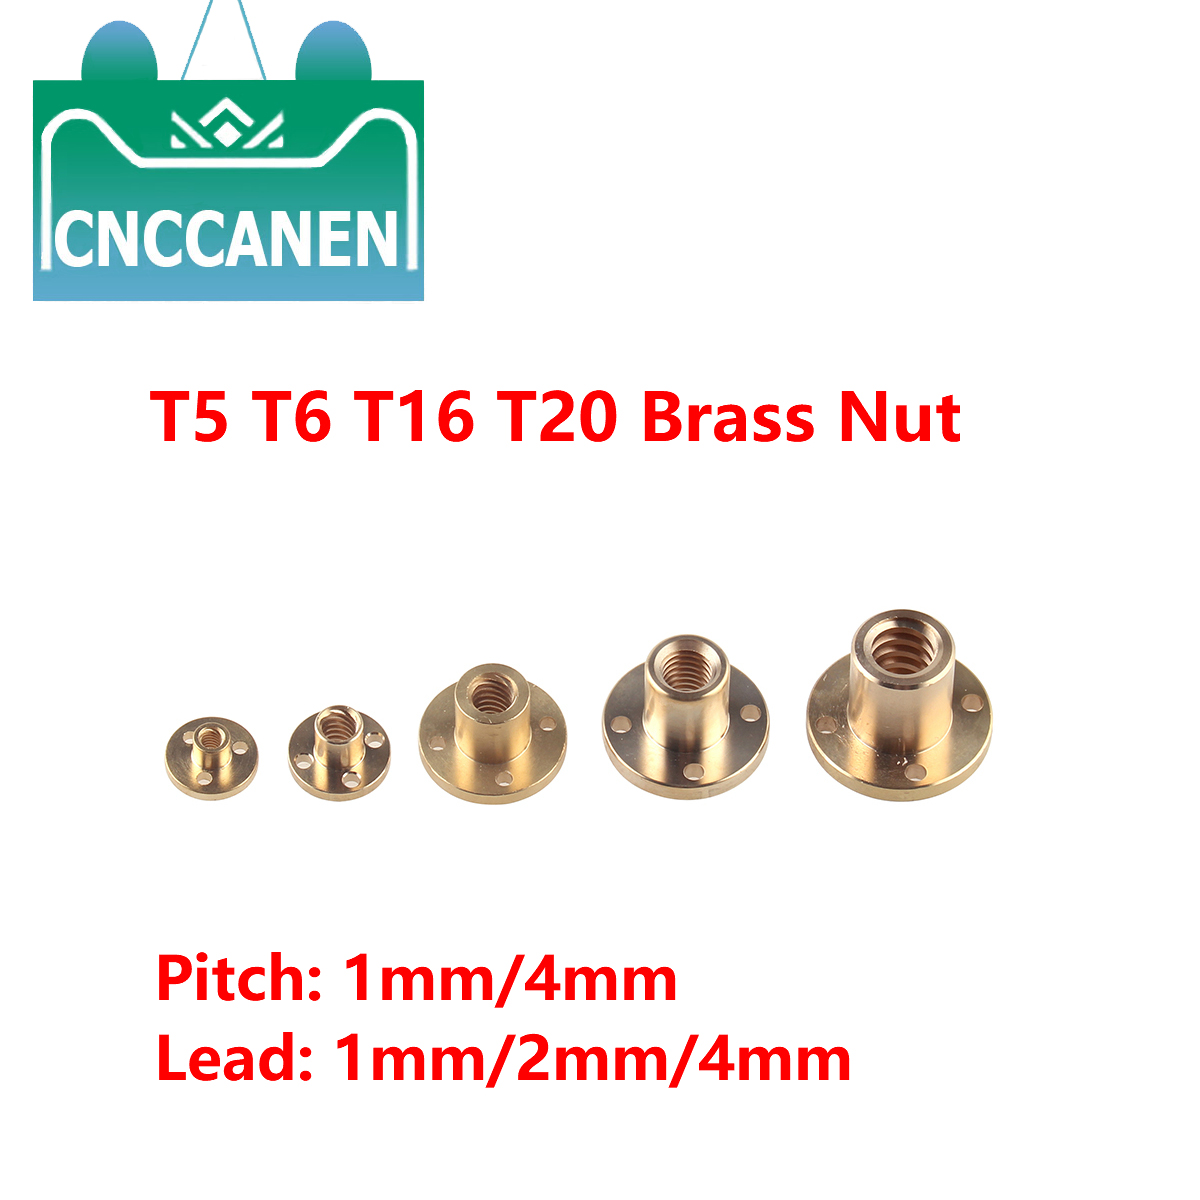 T8 2mm Lead Screw Length 1000mm /& Brass Nut Pitch 2mm Lead 2mm CNC 3D Printer